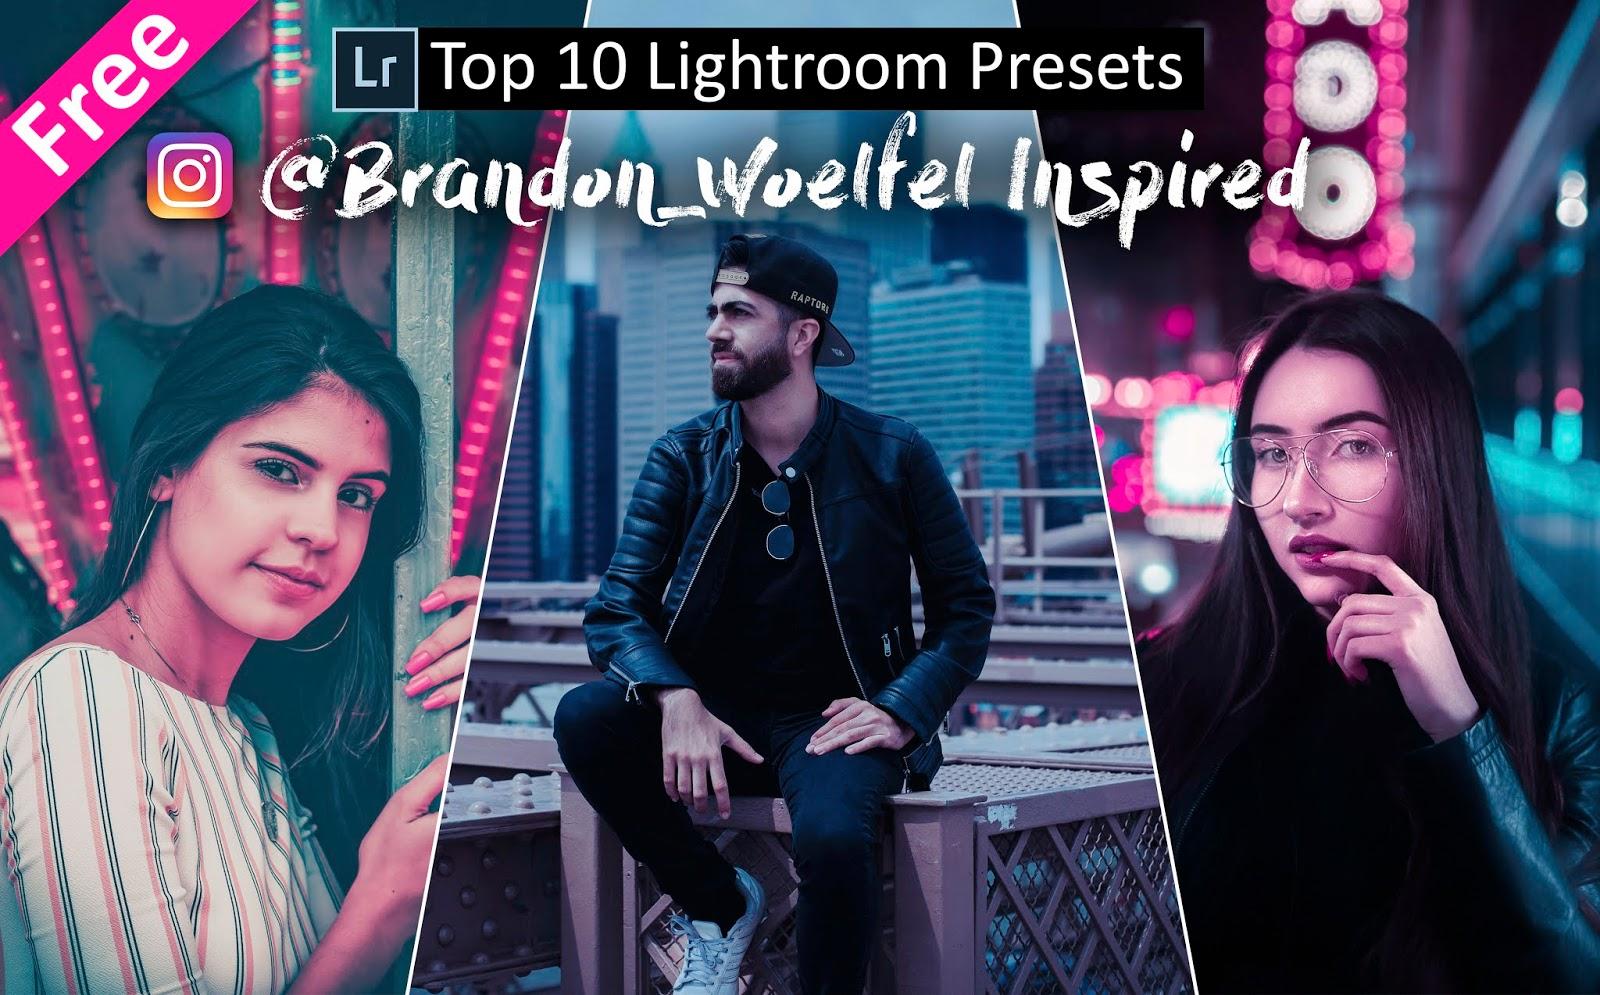 Download Top 10 @Brandon Woelfel Inspired Lightroom Presets for Free